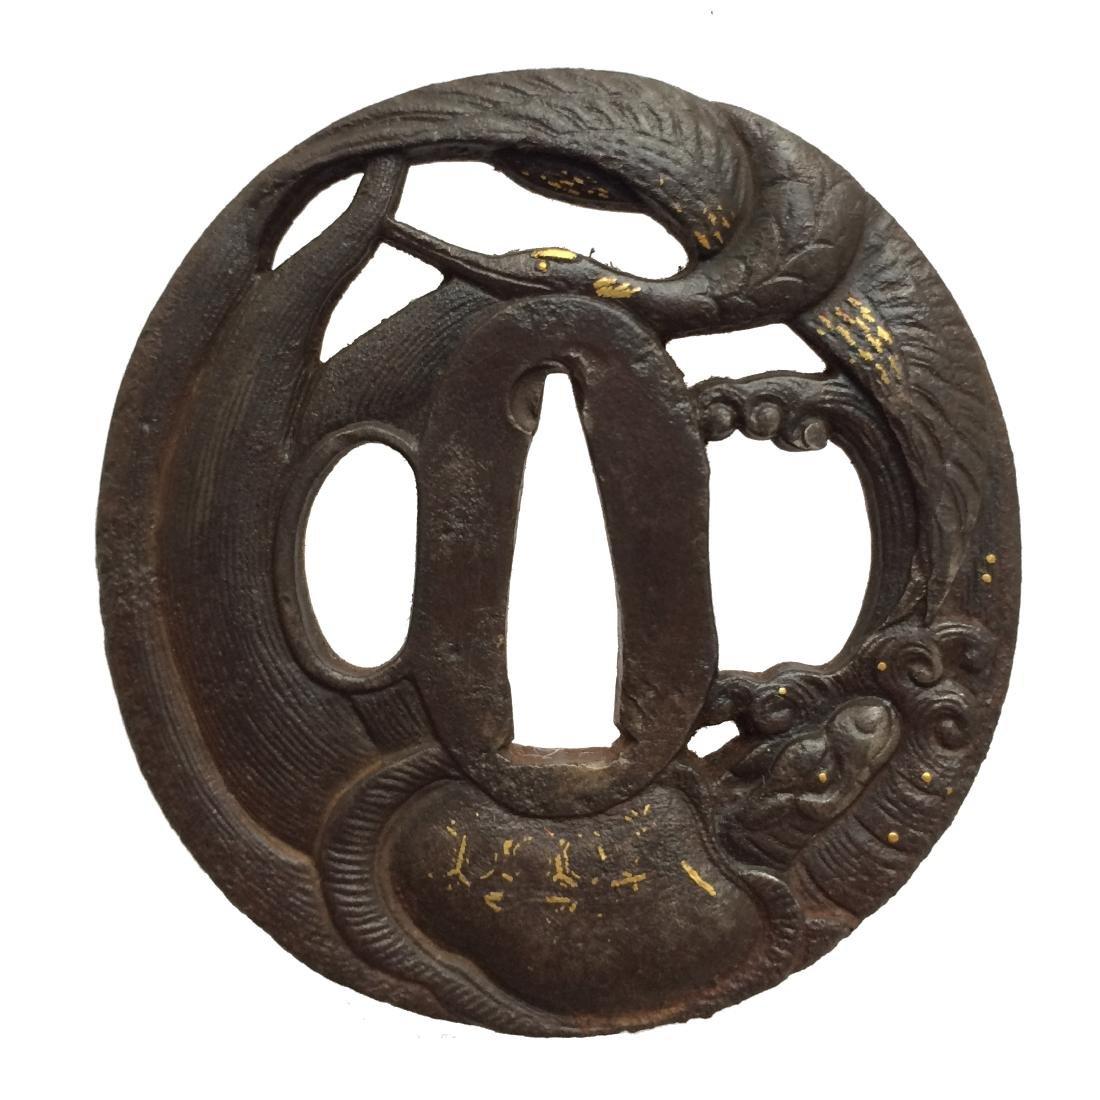 Iron tsuba with tortoise and crane motif